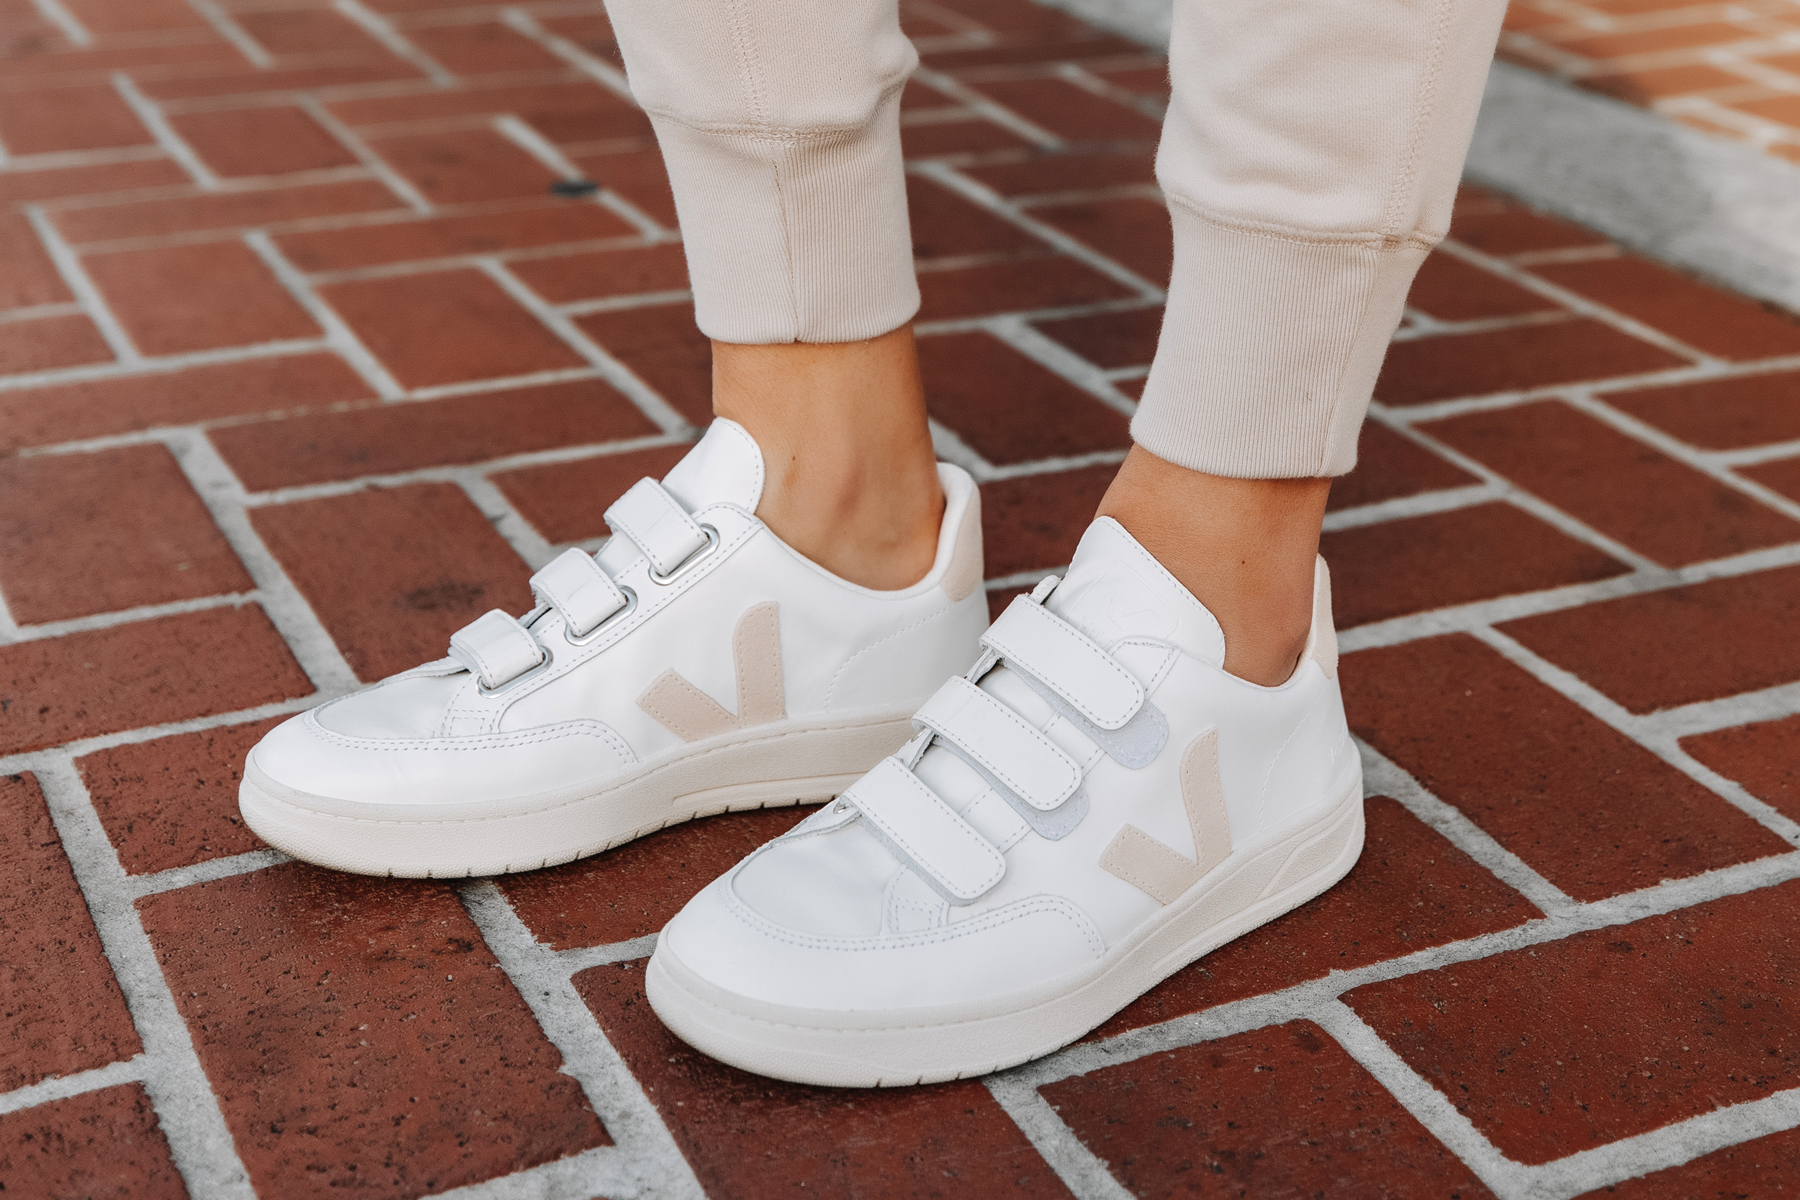 Fashion Jackson Veja V-LOCK Sneaker Review